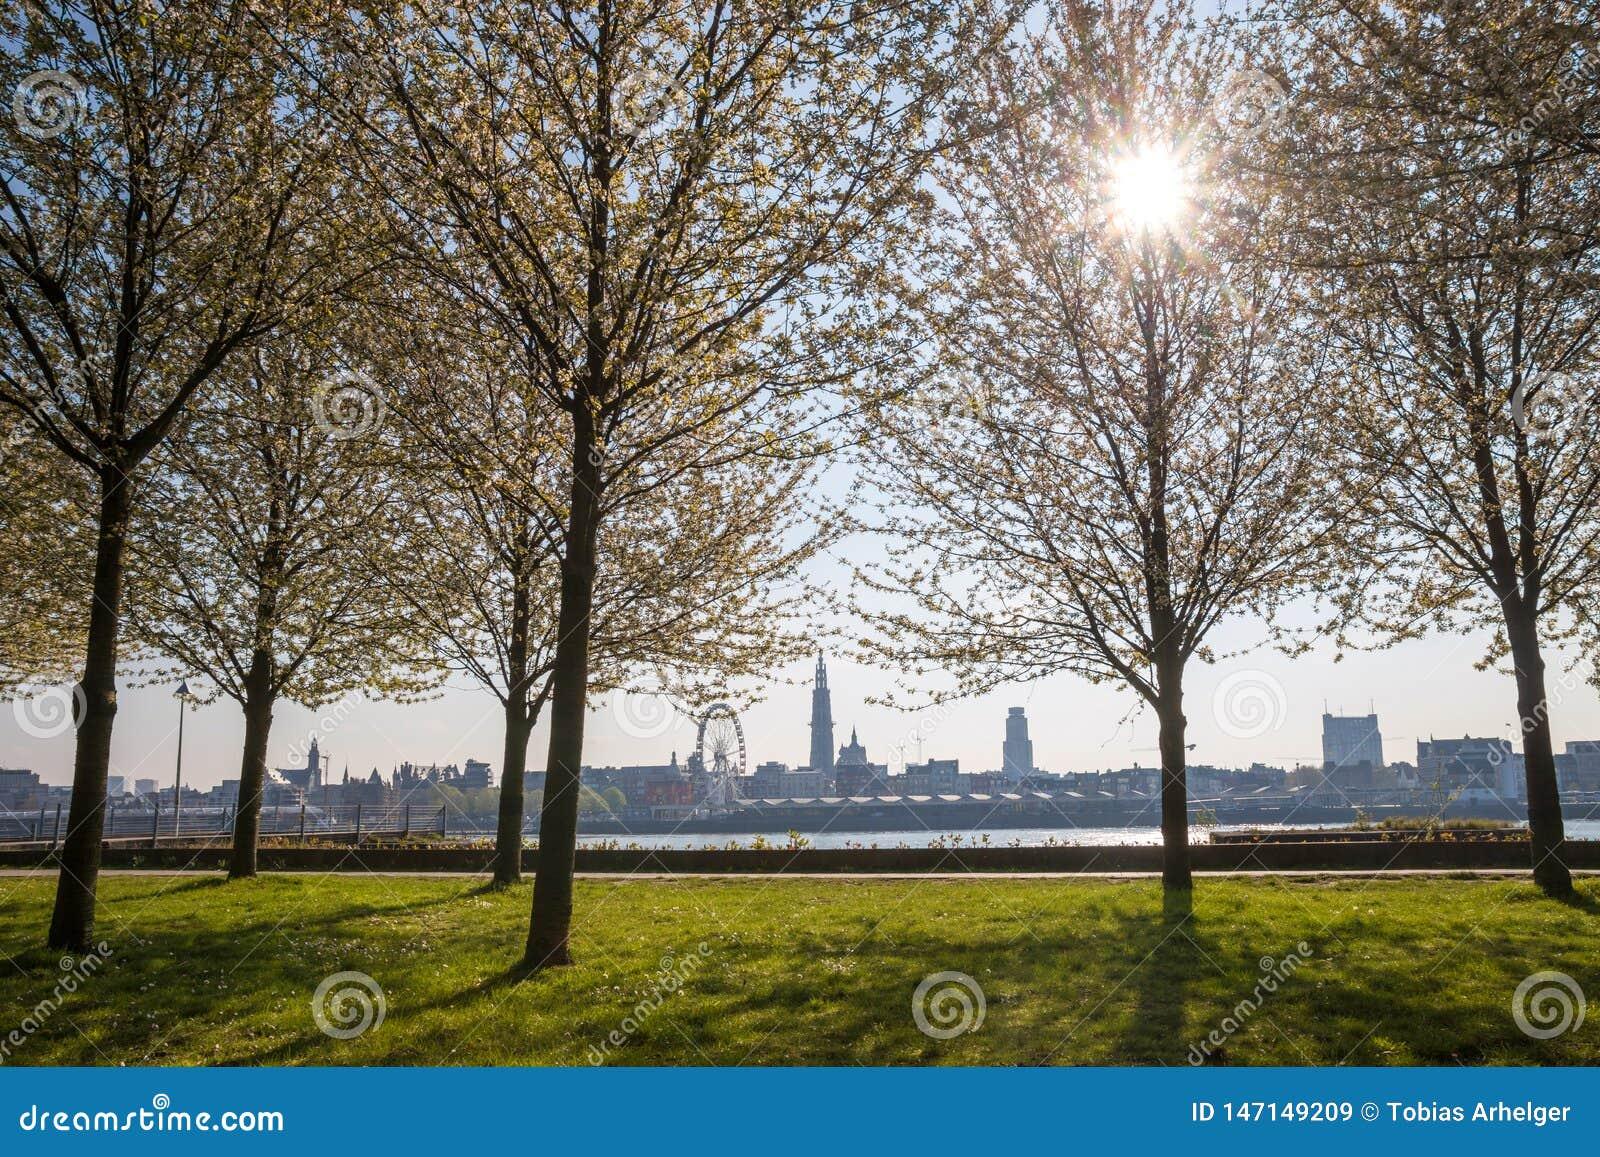 Antwerpen Belgium pogodny pejza? miejski